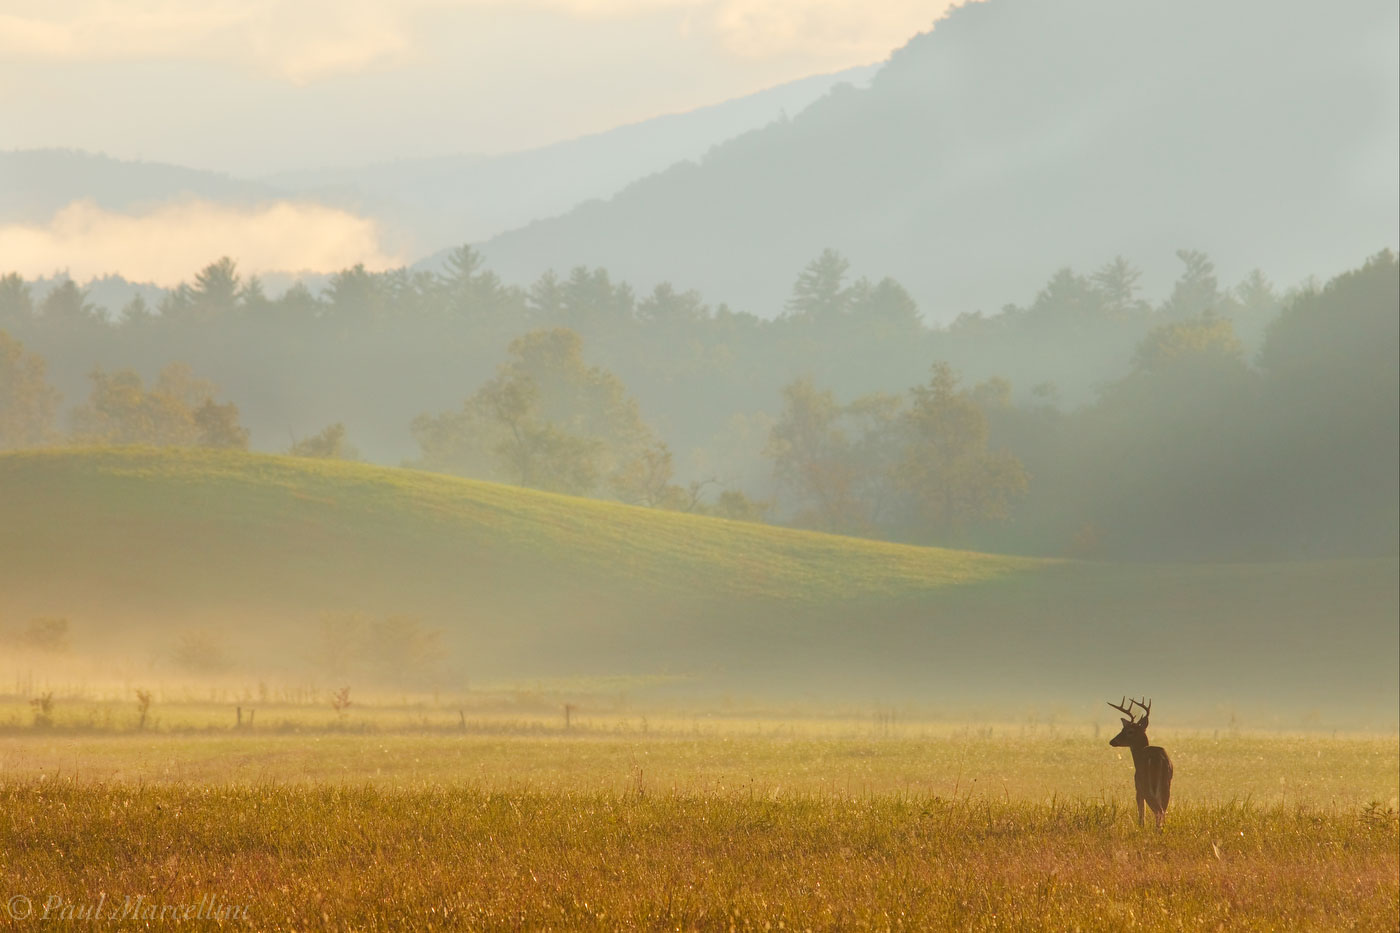 Odocoileus virginianus, white-tailed deer, cades cove, great smoky mountains national park, fog, morning, deer, photo